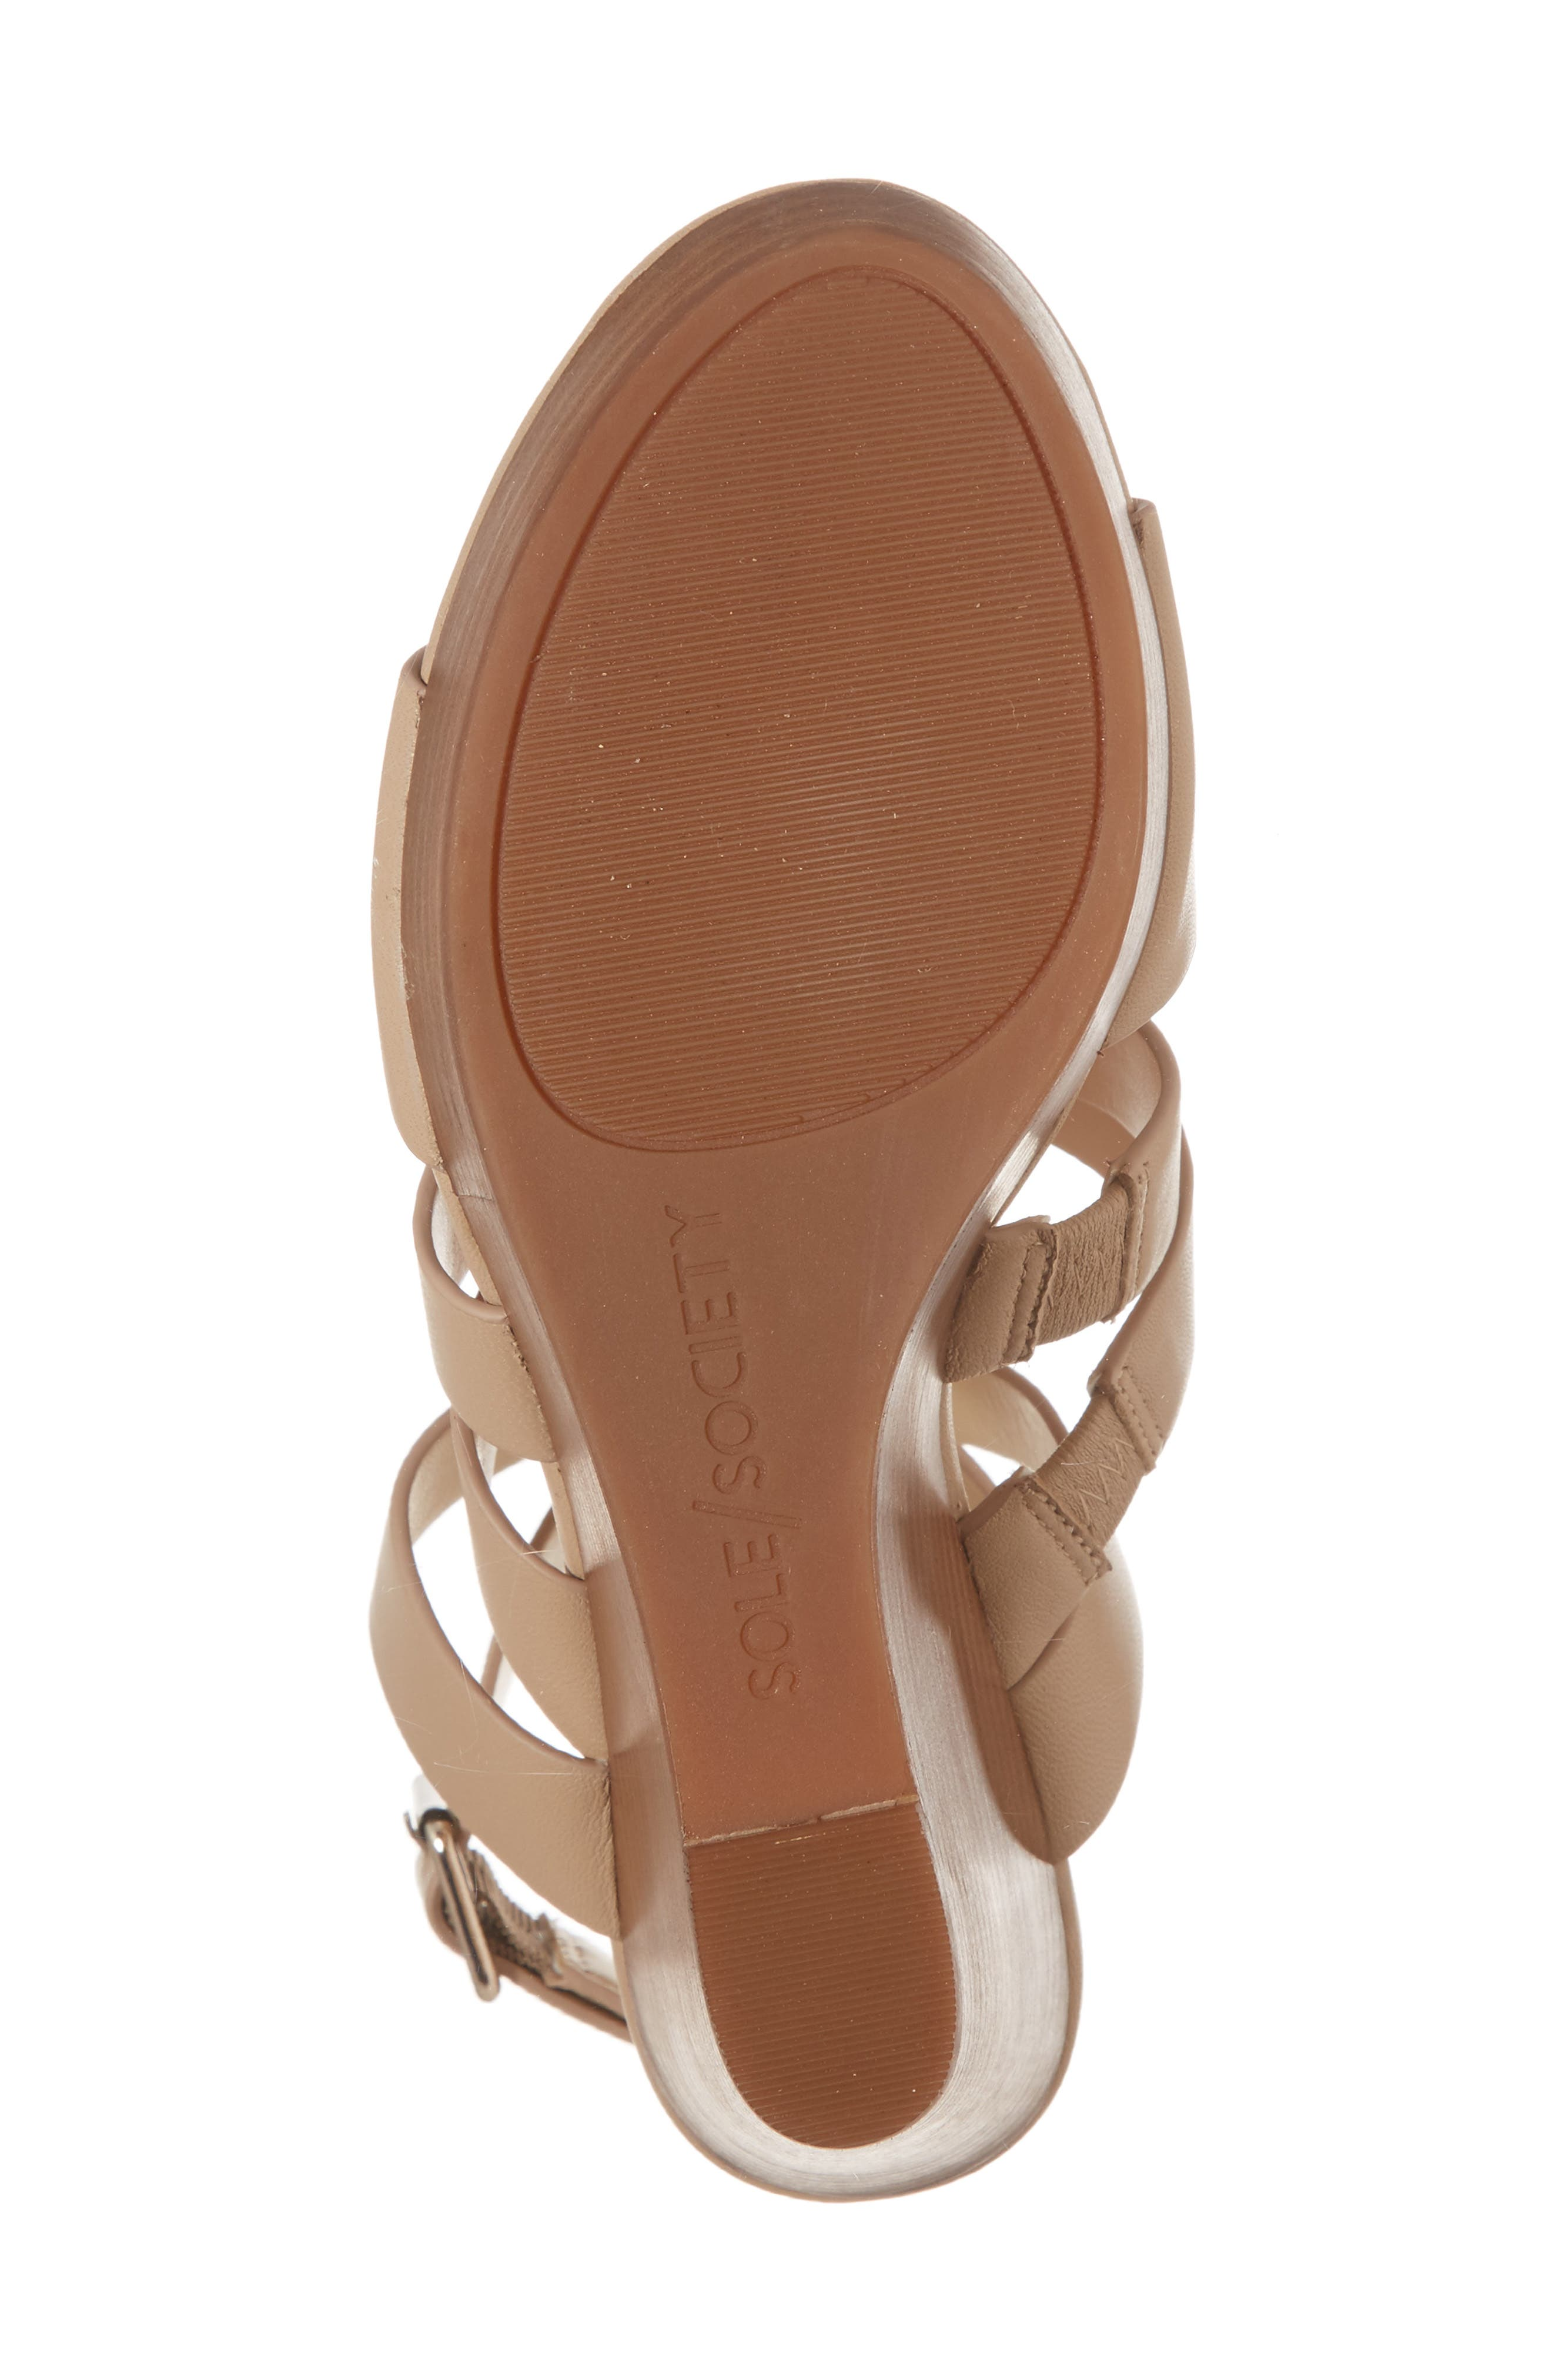 Pippy Platform Sandal,                             Alternate thumbnail 6, color,                             TAN